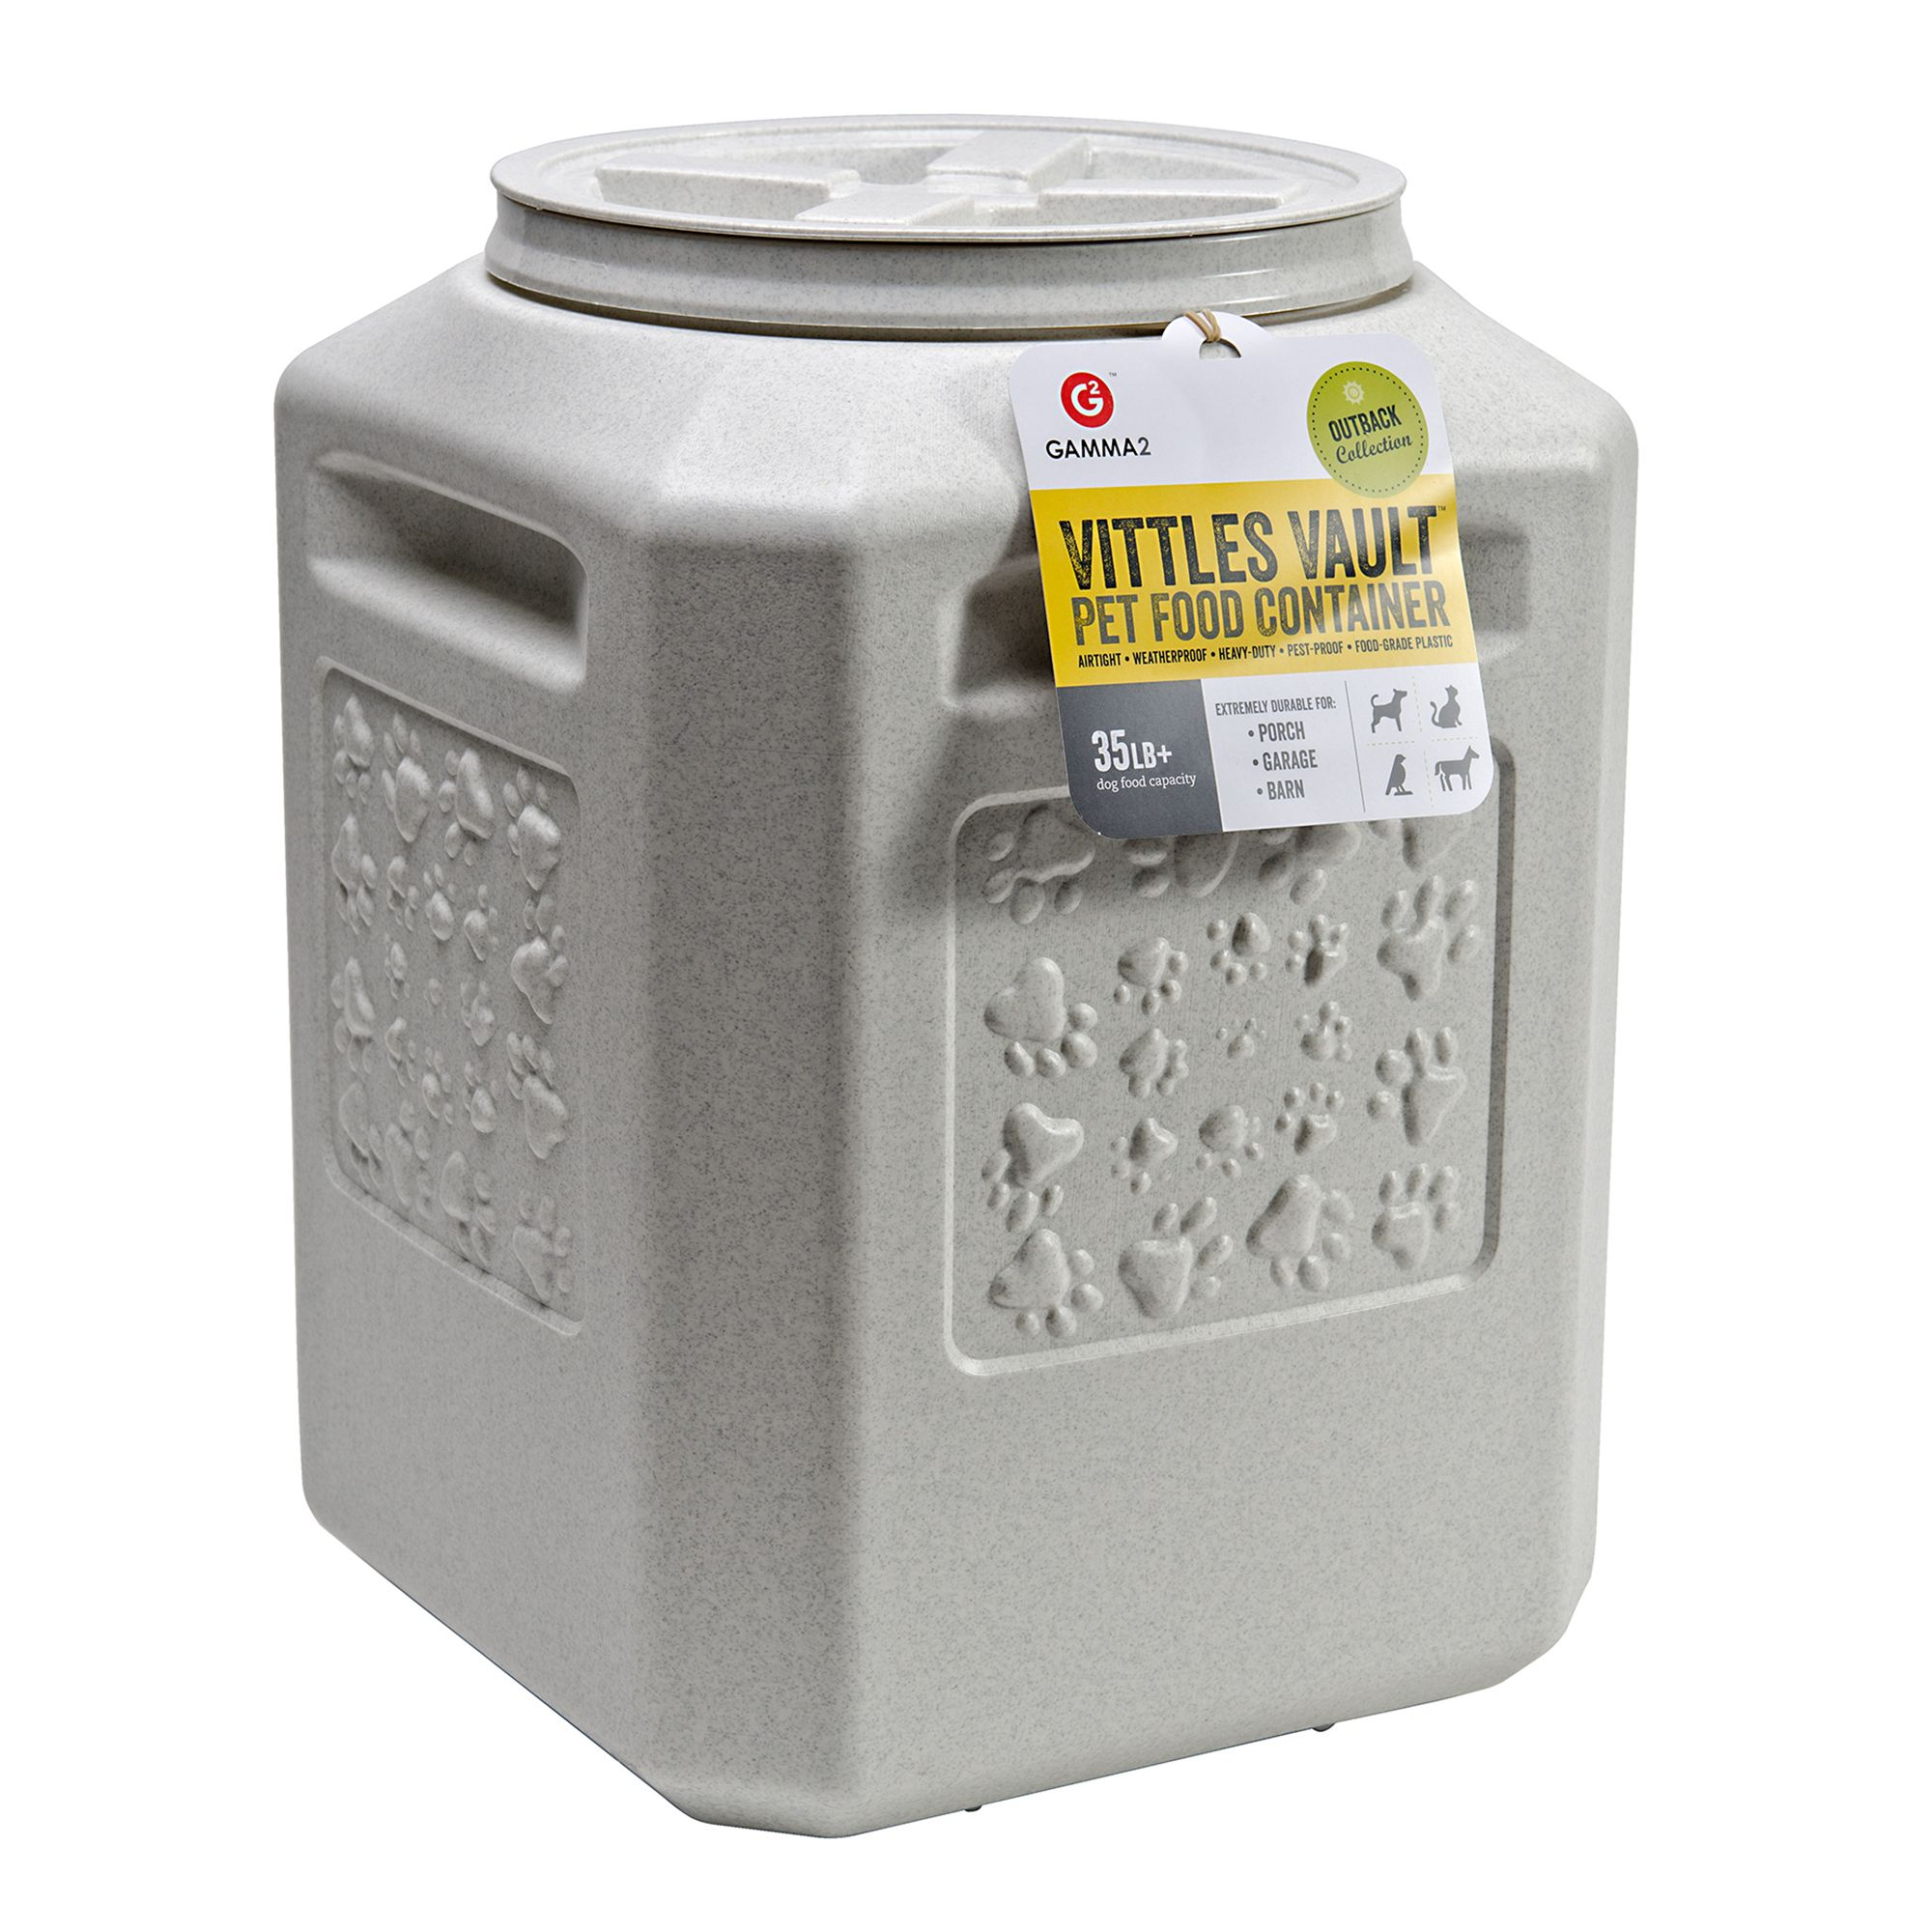 Vittle Vault Pet Food Container Size 35 Lb White